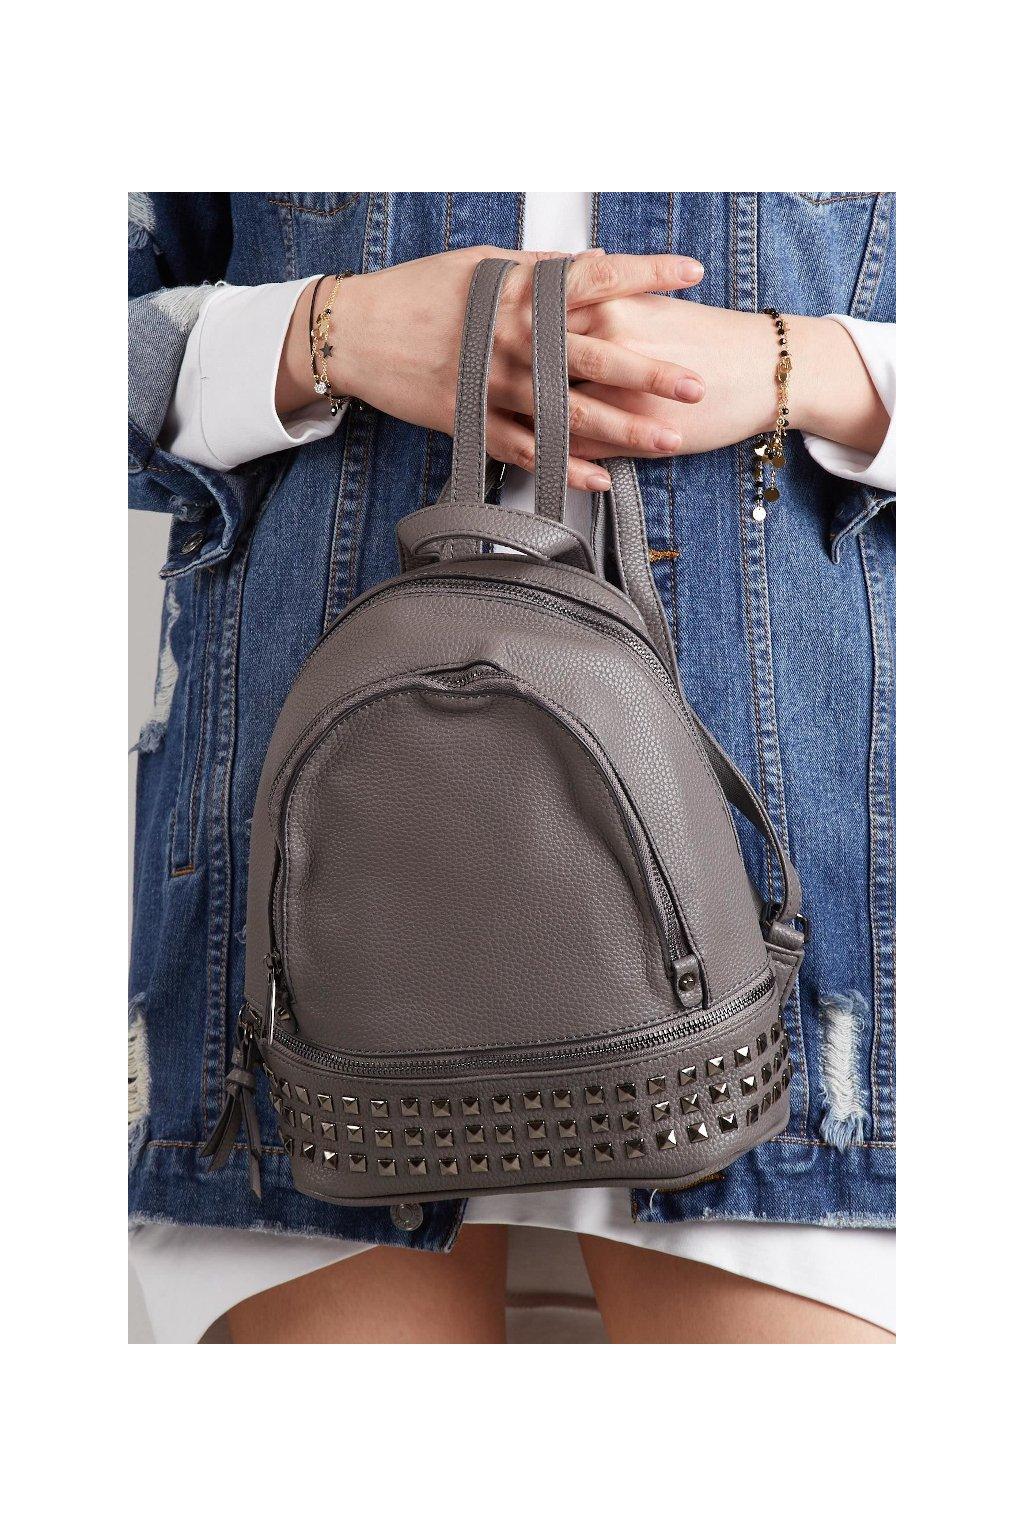 Šedý batoh s kovovým zdobením